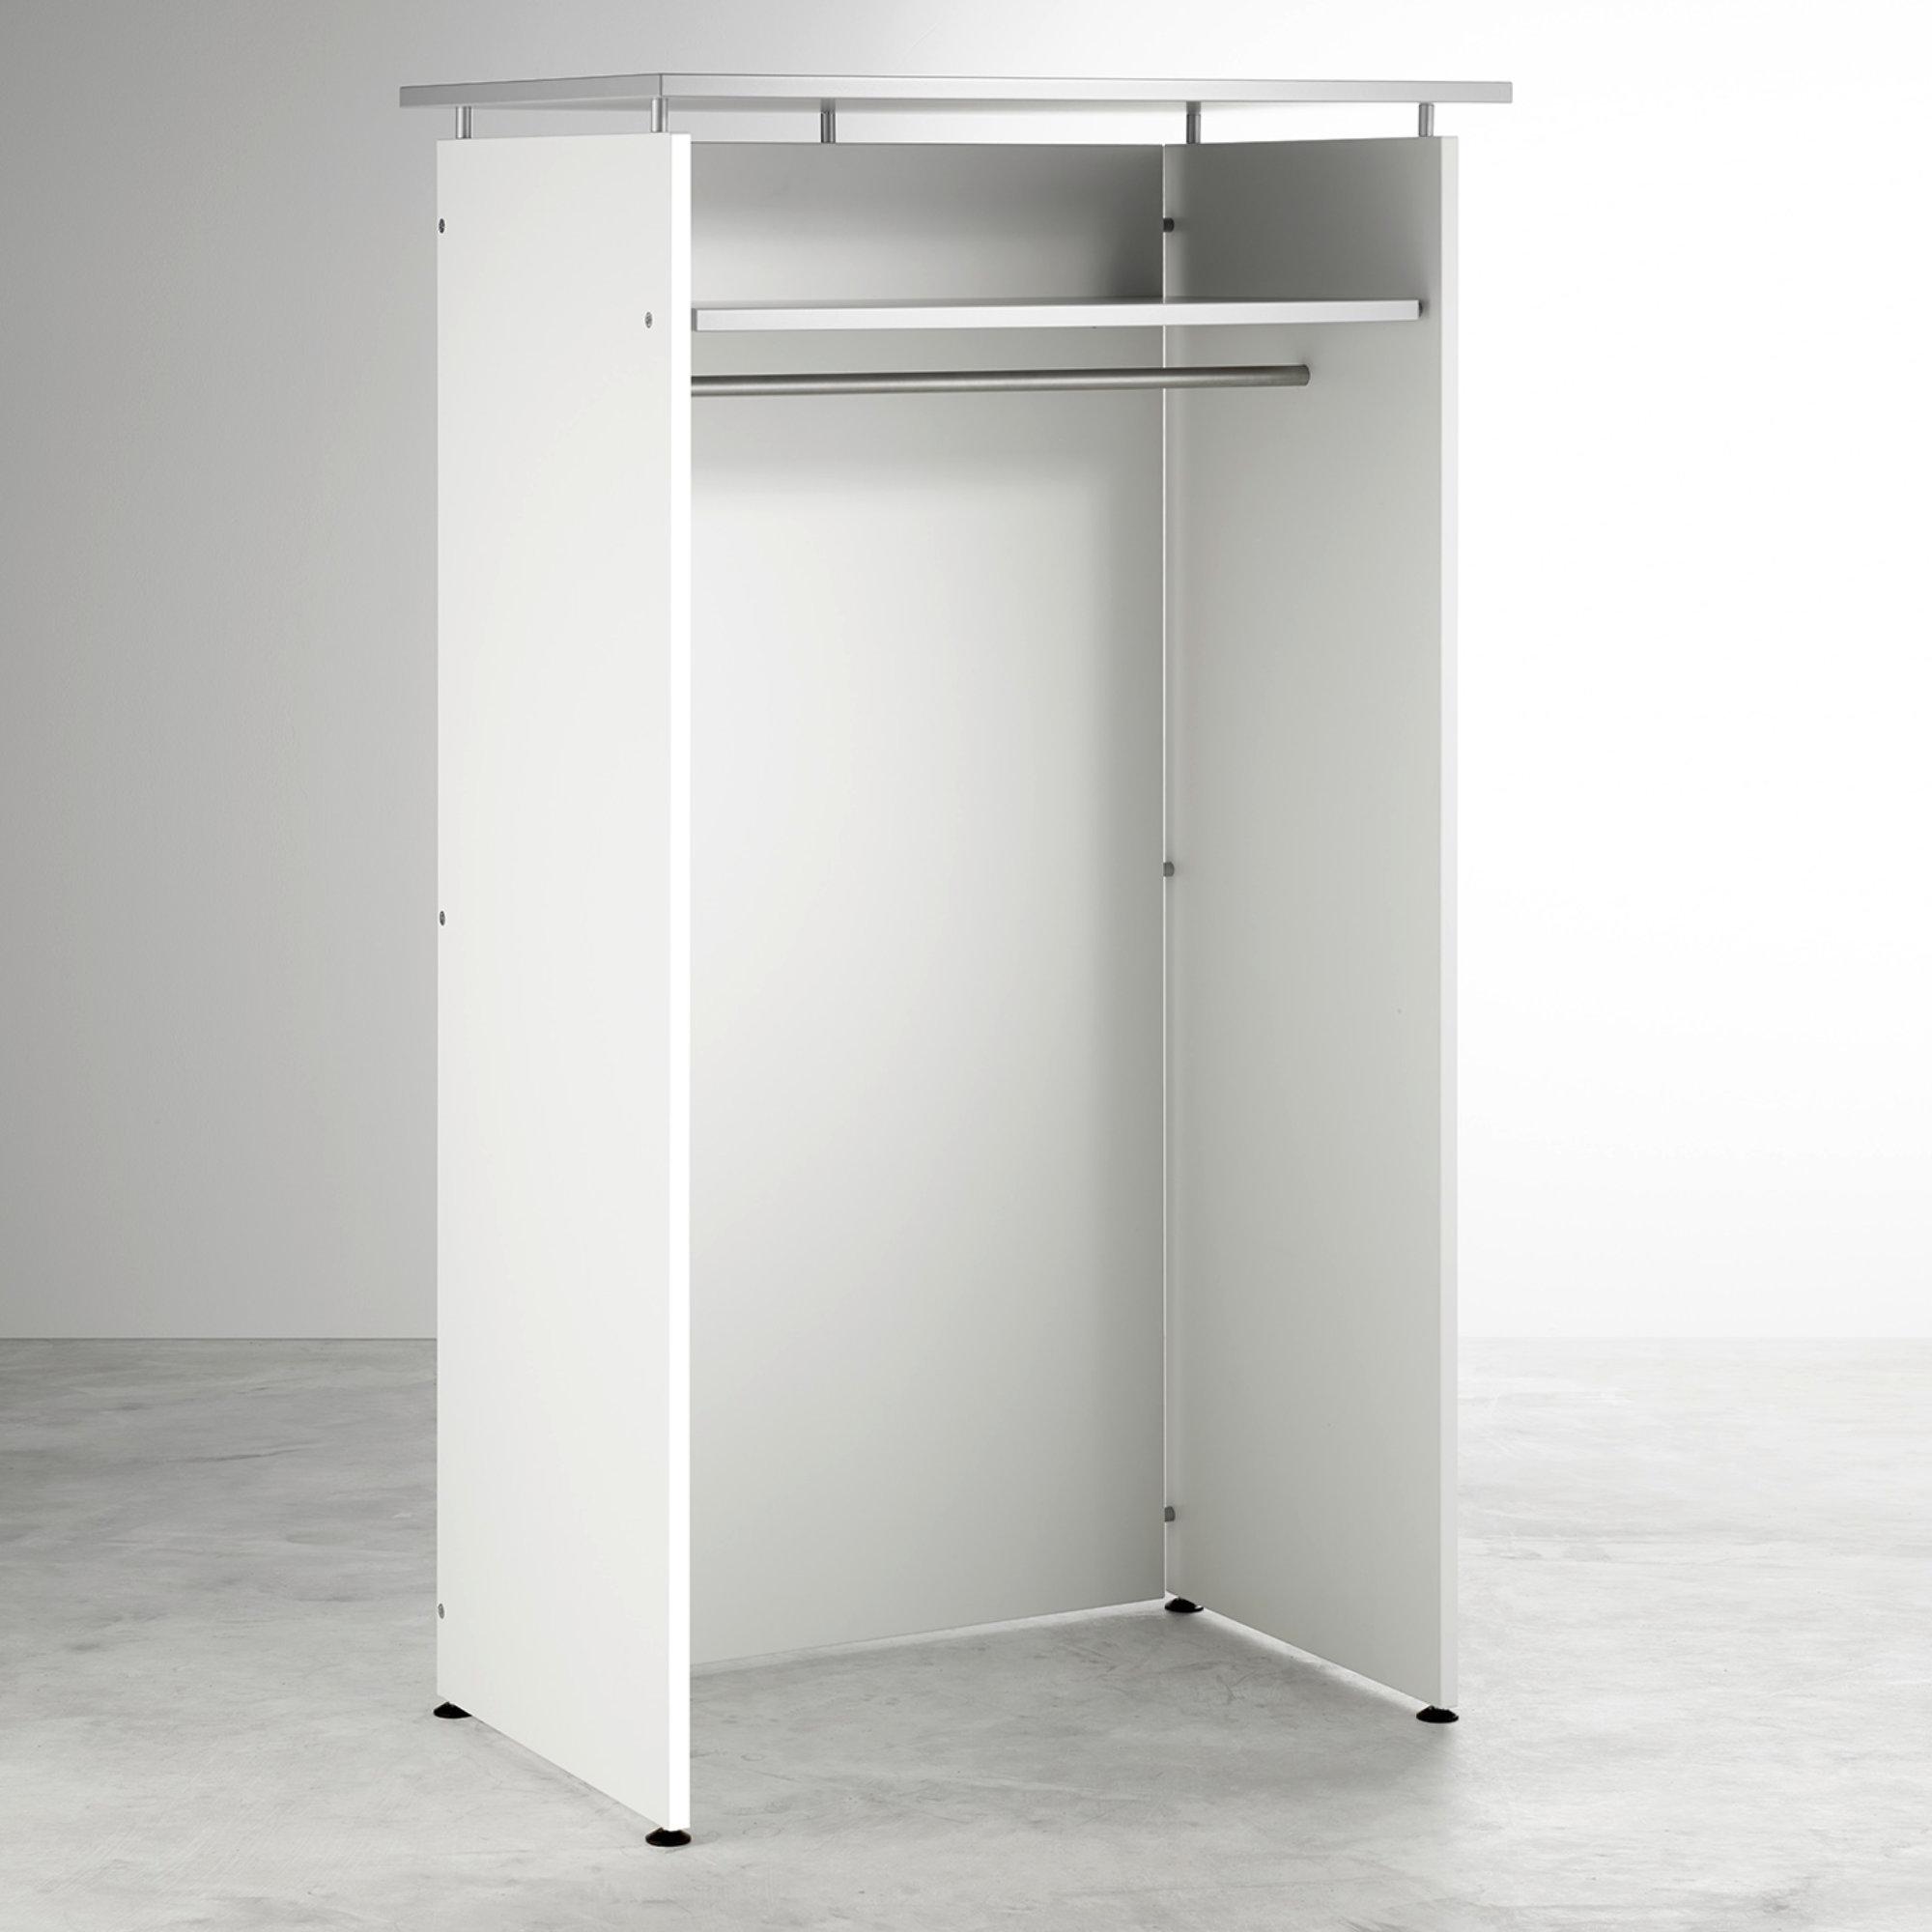 eingangsbereich zubeh r f rs b ro alle kategorien. Black Bedroom Furniture Sets. Home Design Ideas